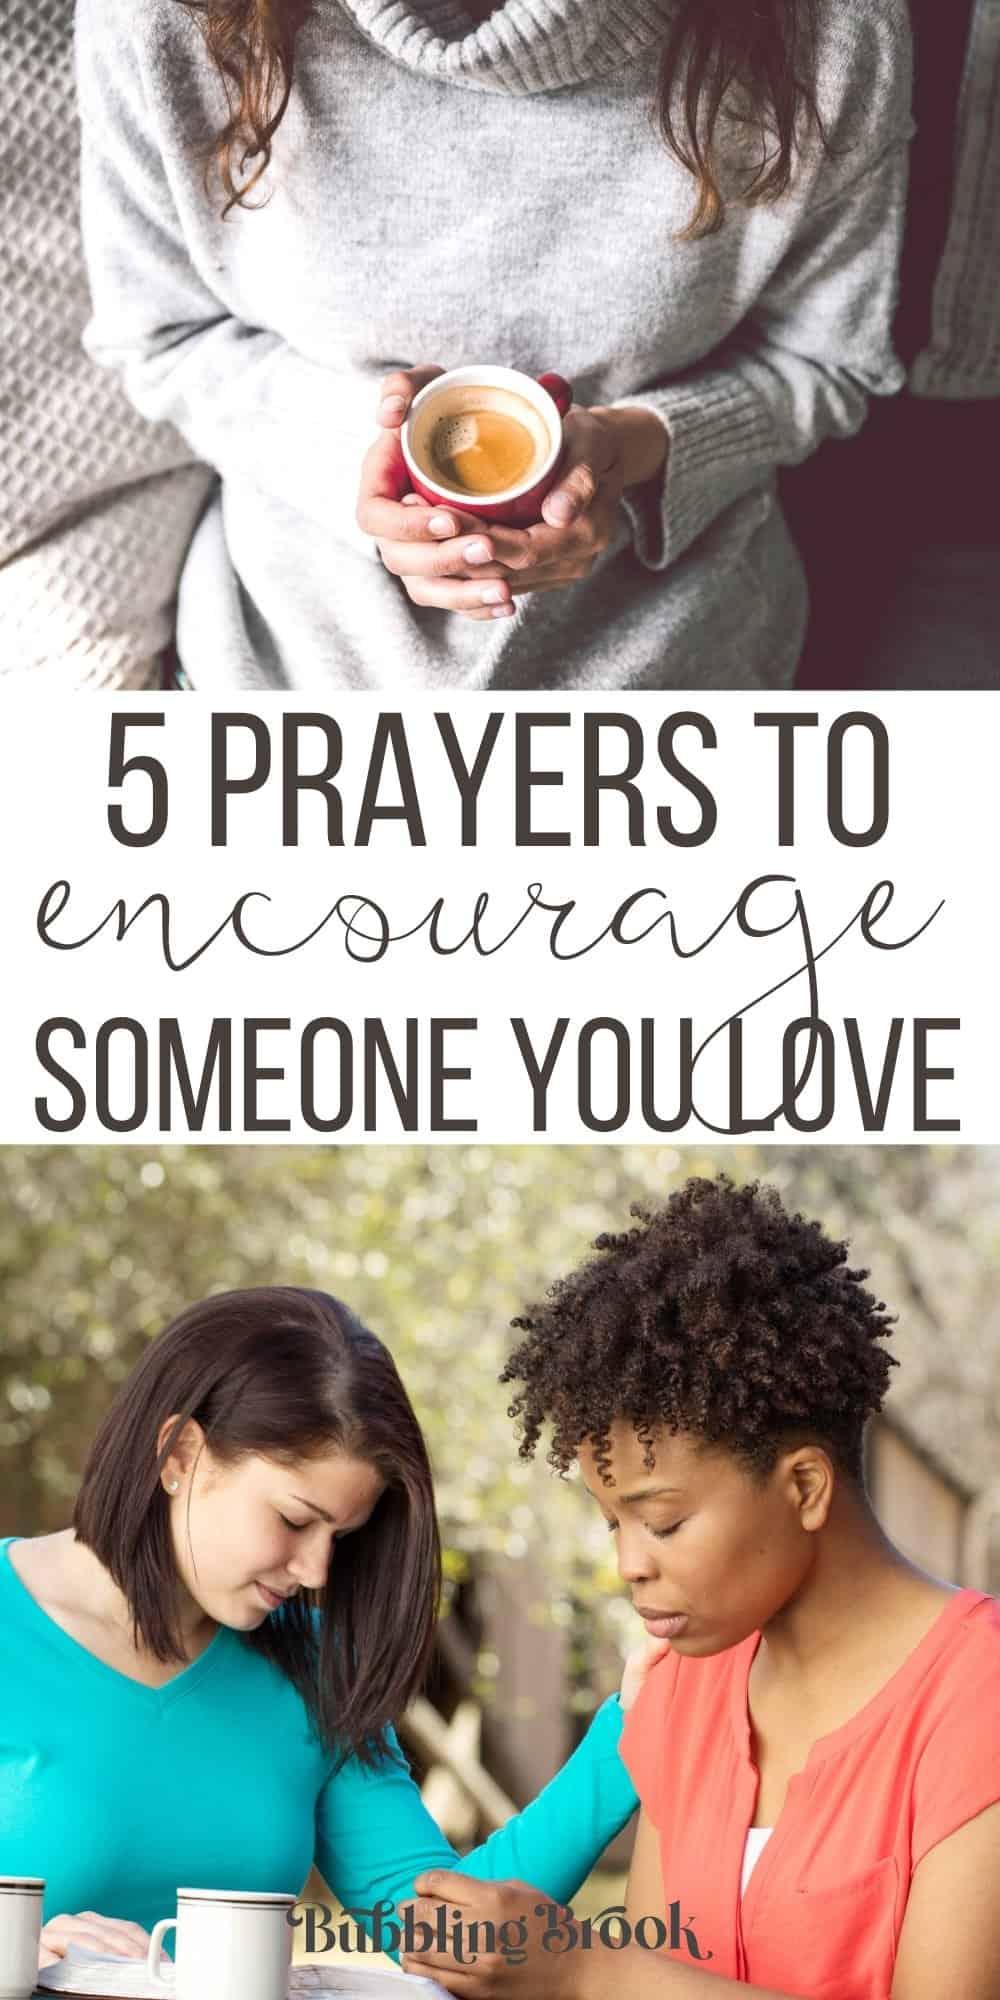 5 Uplifting Prayers for Encouragement - Pin for Pinterest